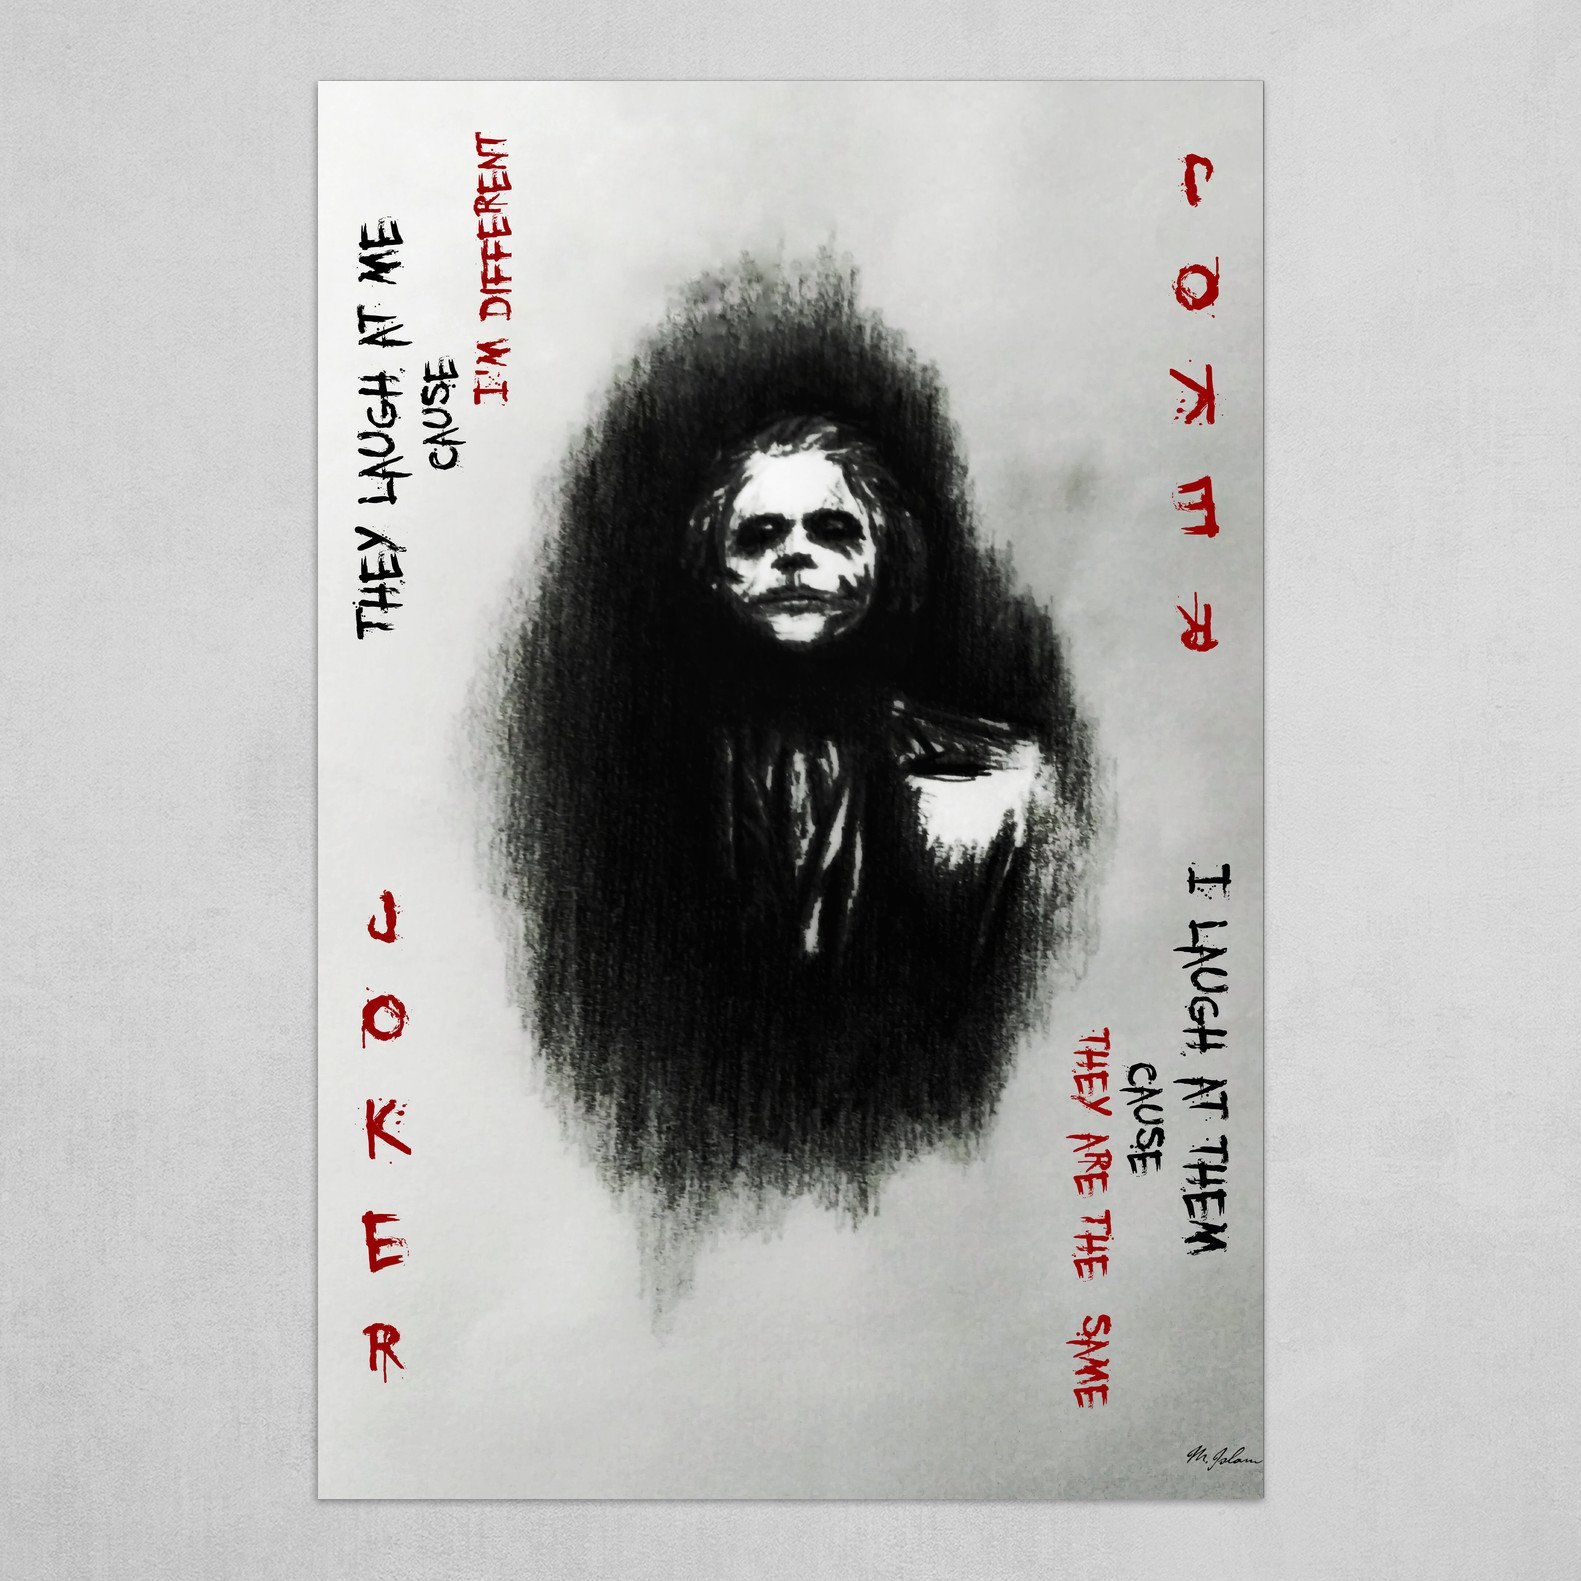 The Joker Official Art Batman High Quality Prints The Dark Knight Poster